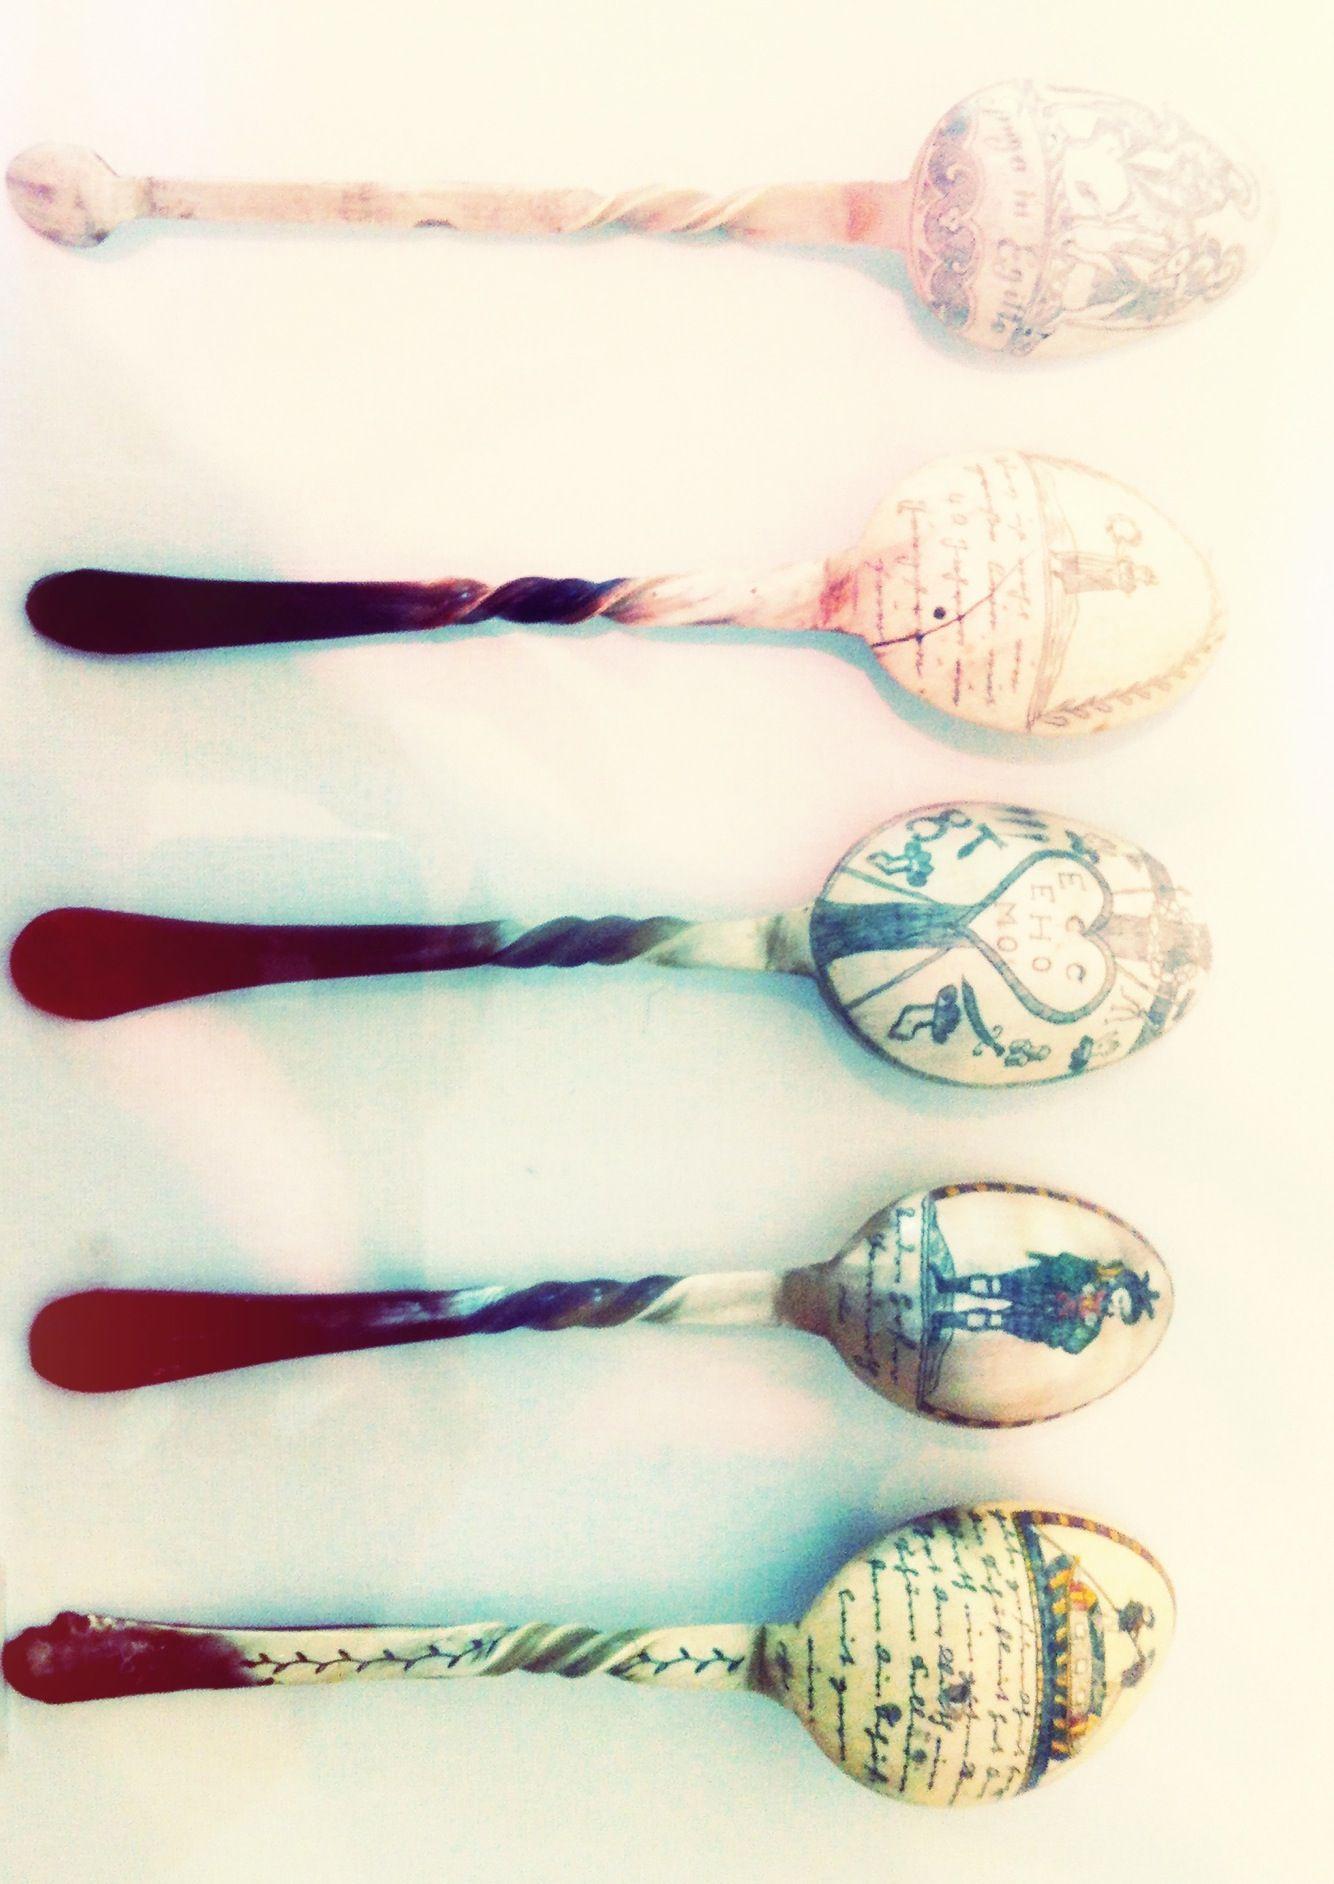 Carved Spoons. | Carved spoons, Carving, Spoon